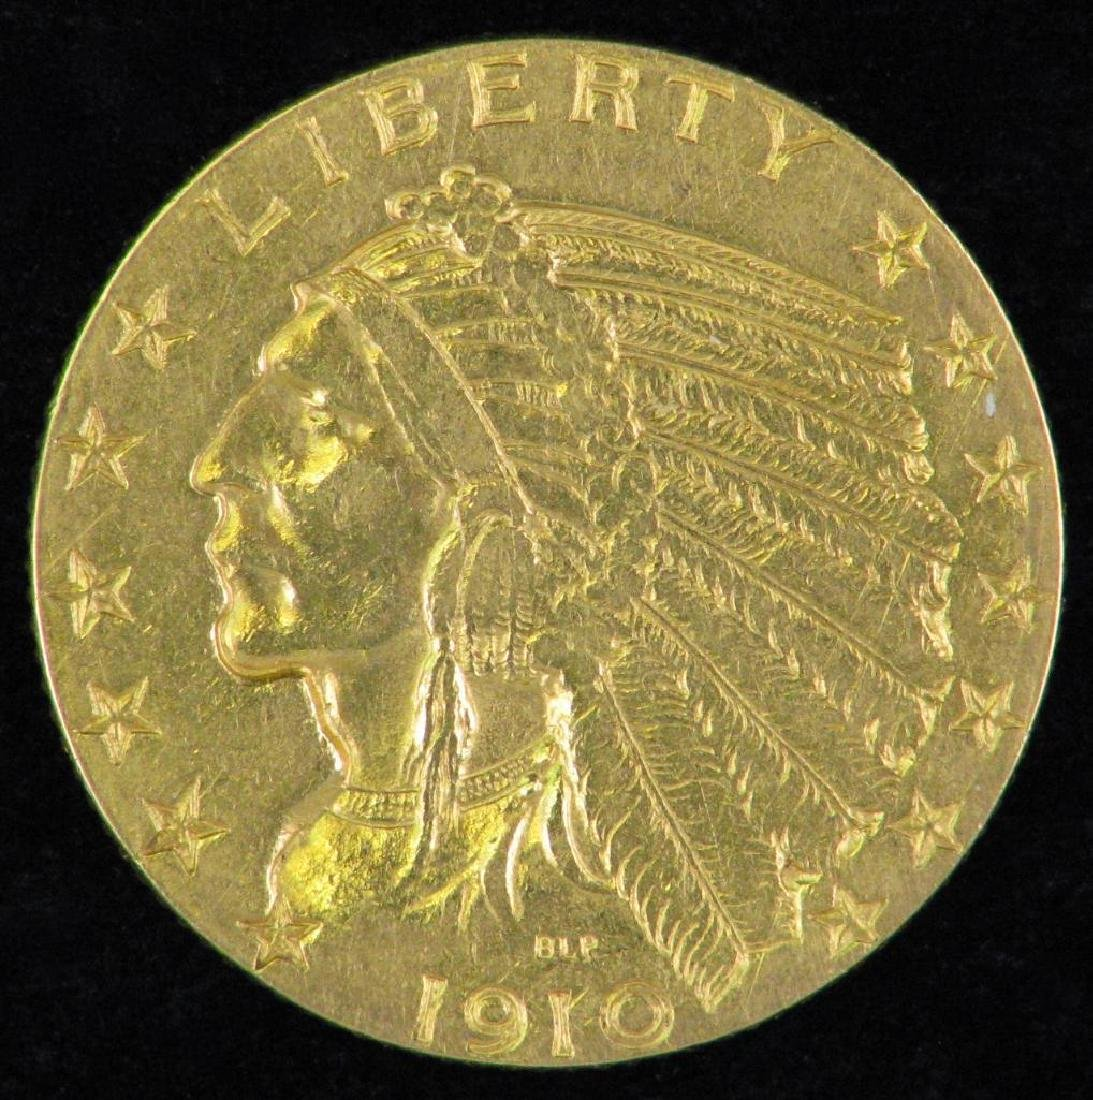 1910-P Indian Head Half EagleÊ